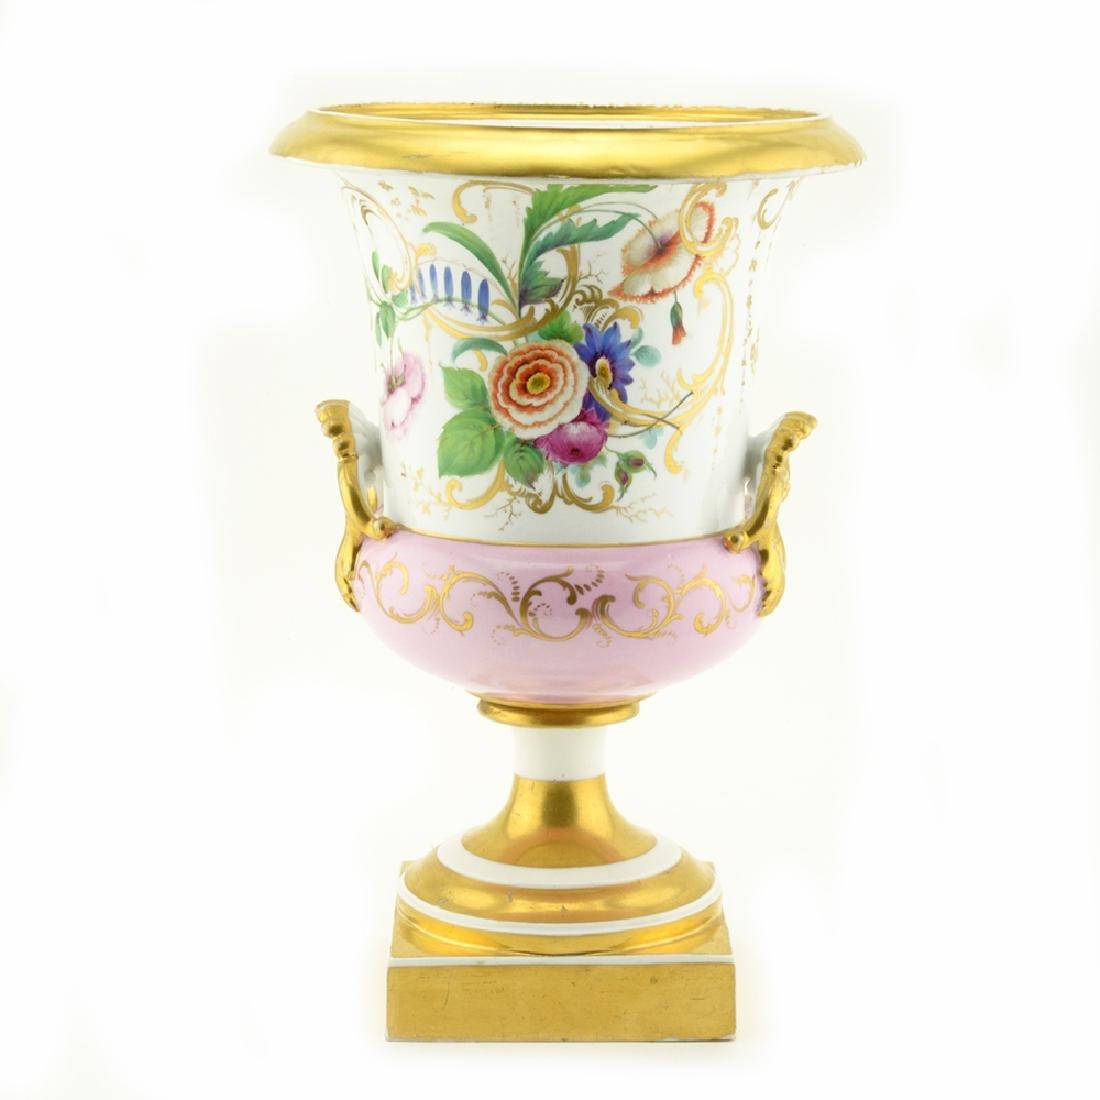 Russian Imperial porcelain vase